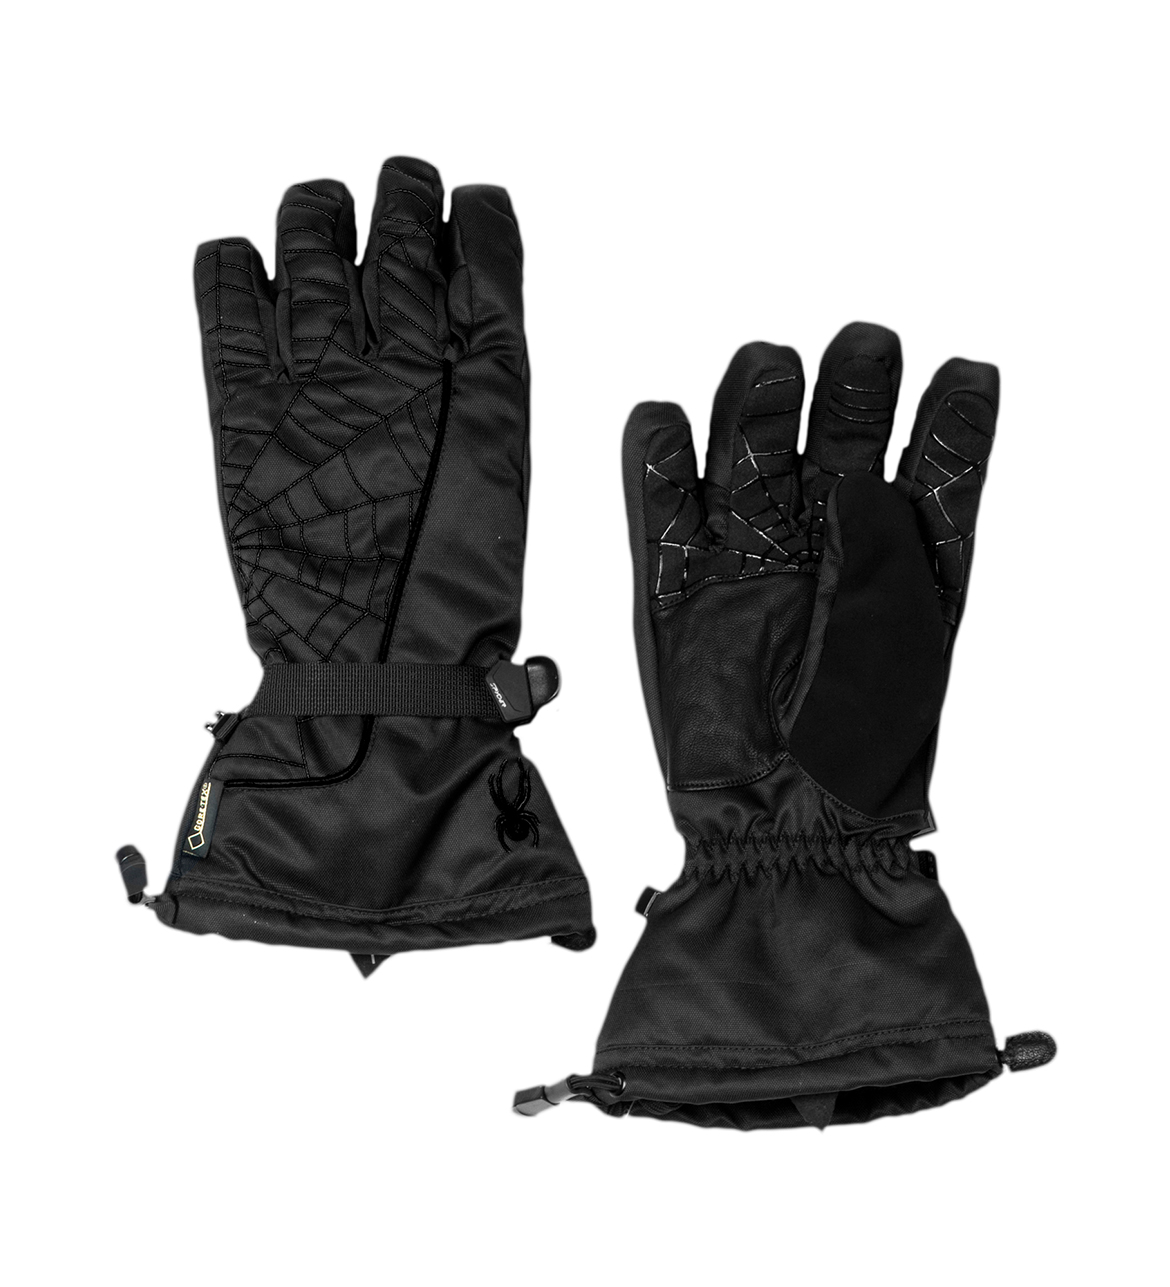 Mens ski gloves xl - About This Item Spyder Men Over Web Gore Tex Ski Gloves Xl